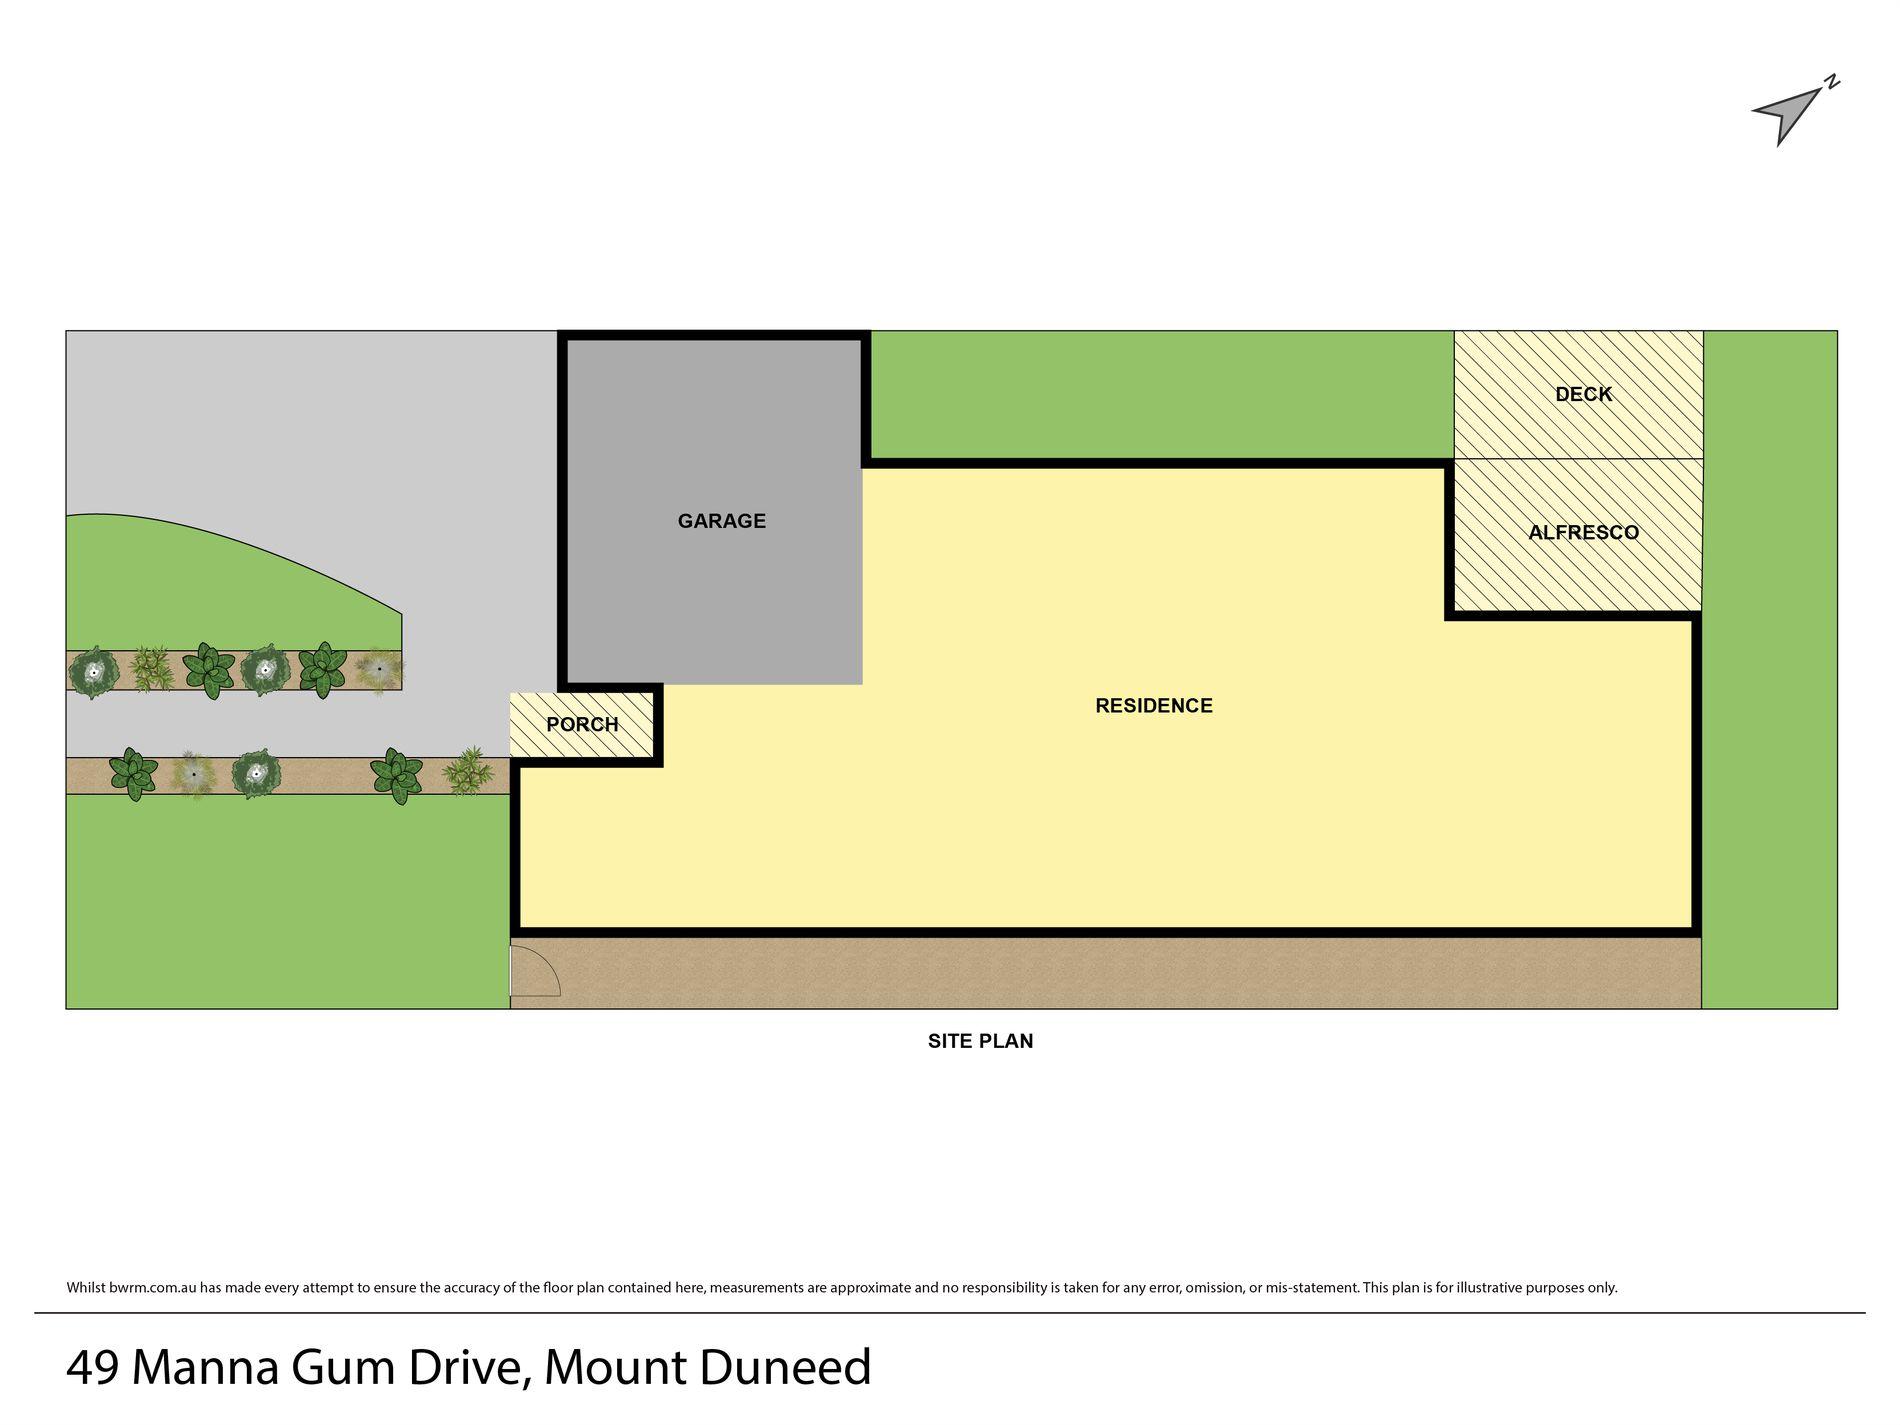 49 MANNA GUM DRIVE, Mount Duneed